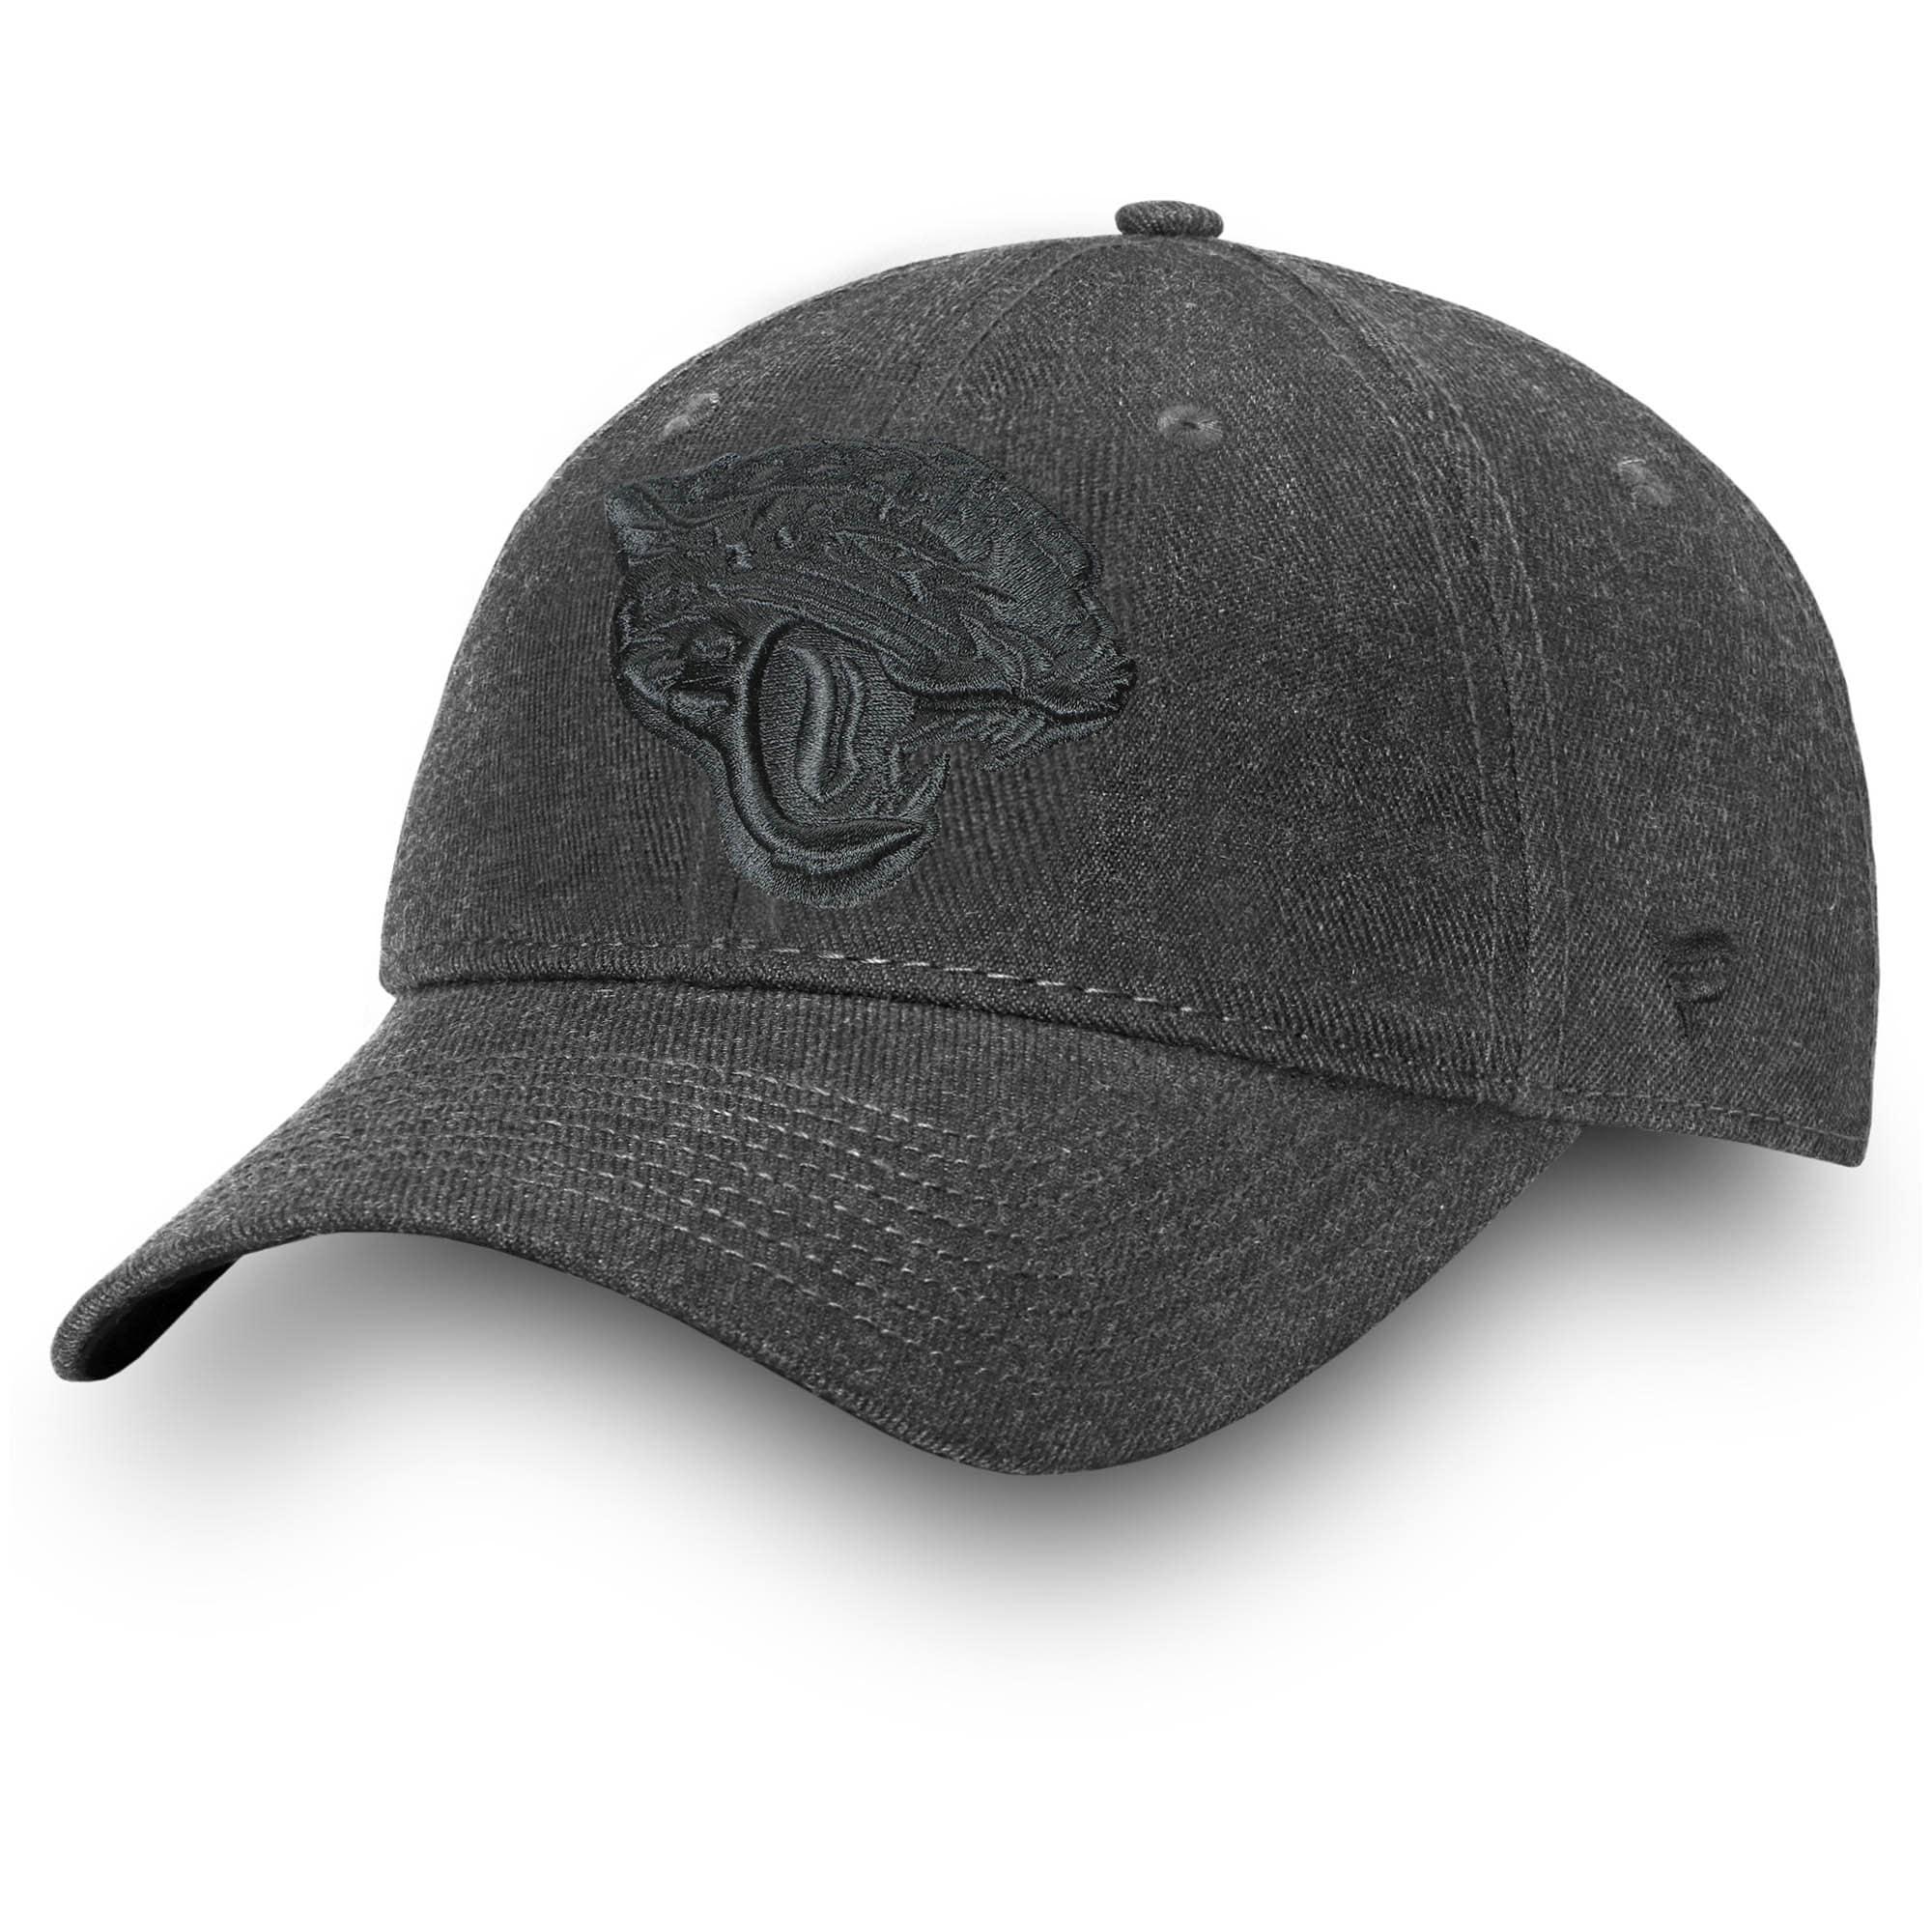 Jacksonville Jaguars NFL Pro Line by Fanatics Branded Logo Team Haze Adjustable Snapback Hat - Heathered Black